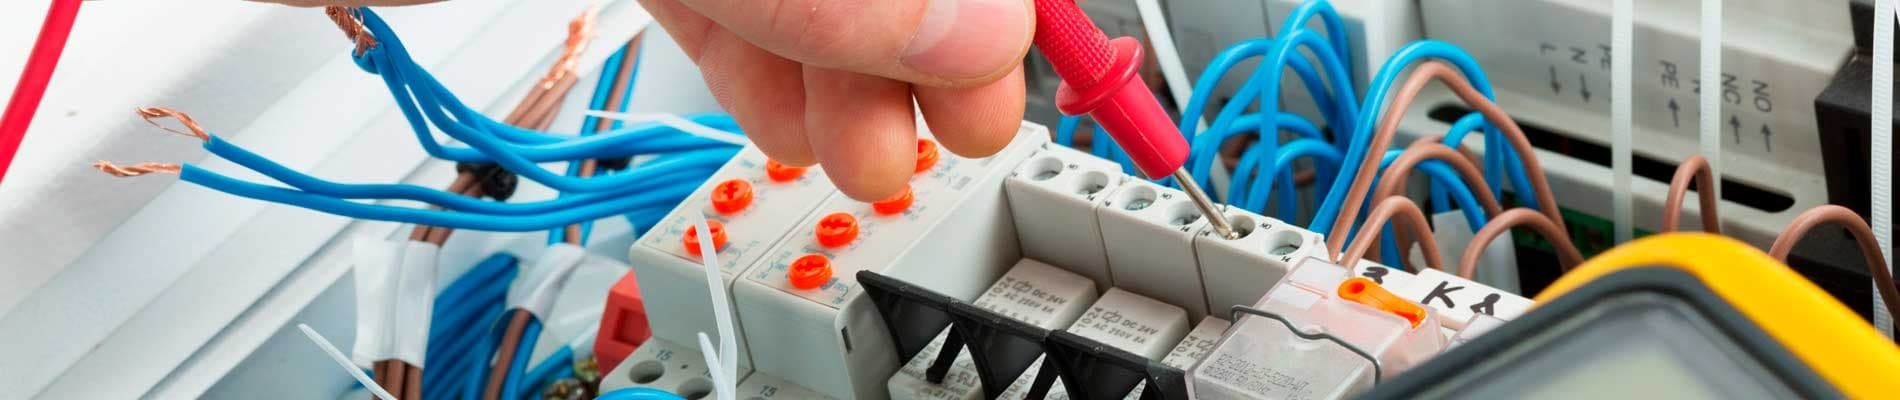 Indústria, mecânica, elétrica e eletrônica